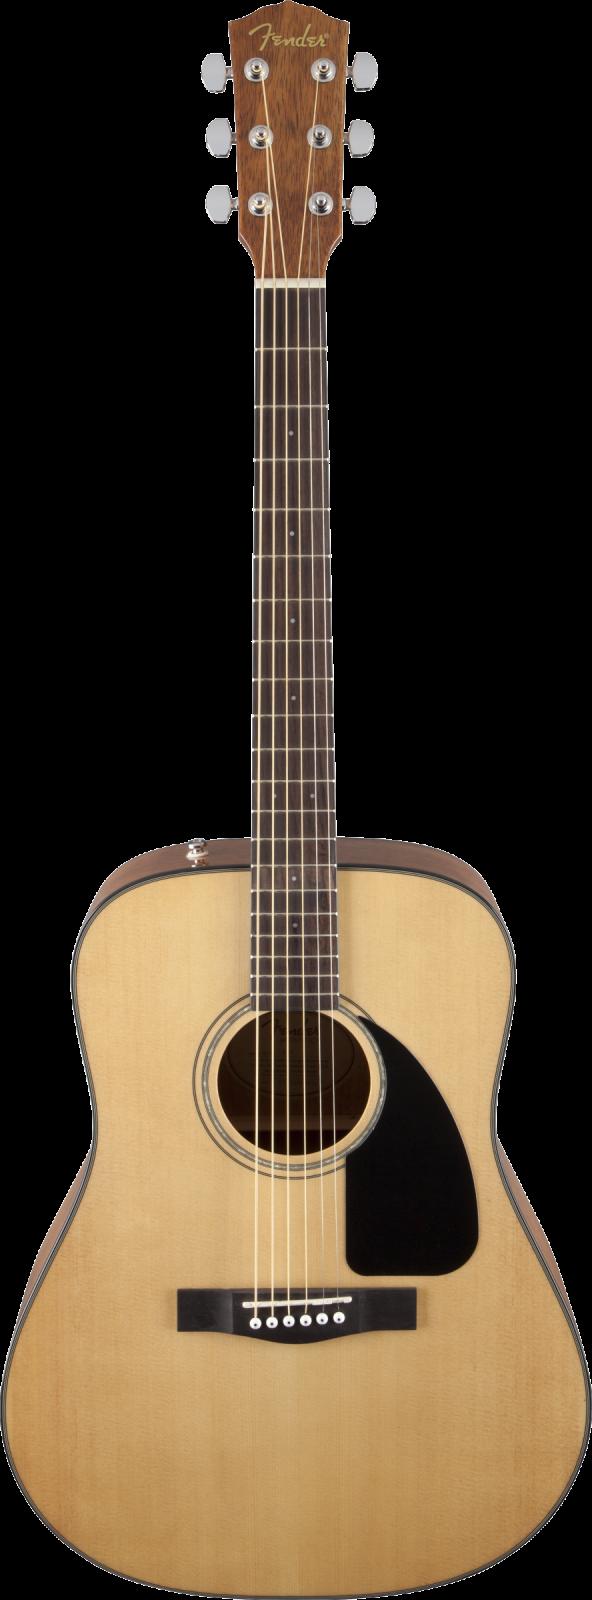 Fender CD-60 Dreadnought V3 w/Case, Walnut Fingerboard, Natural